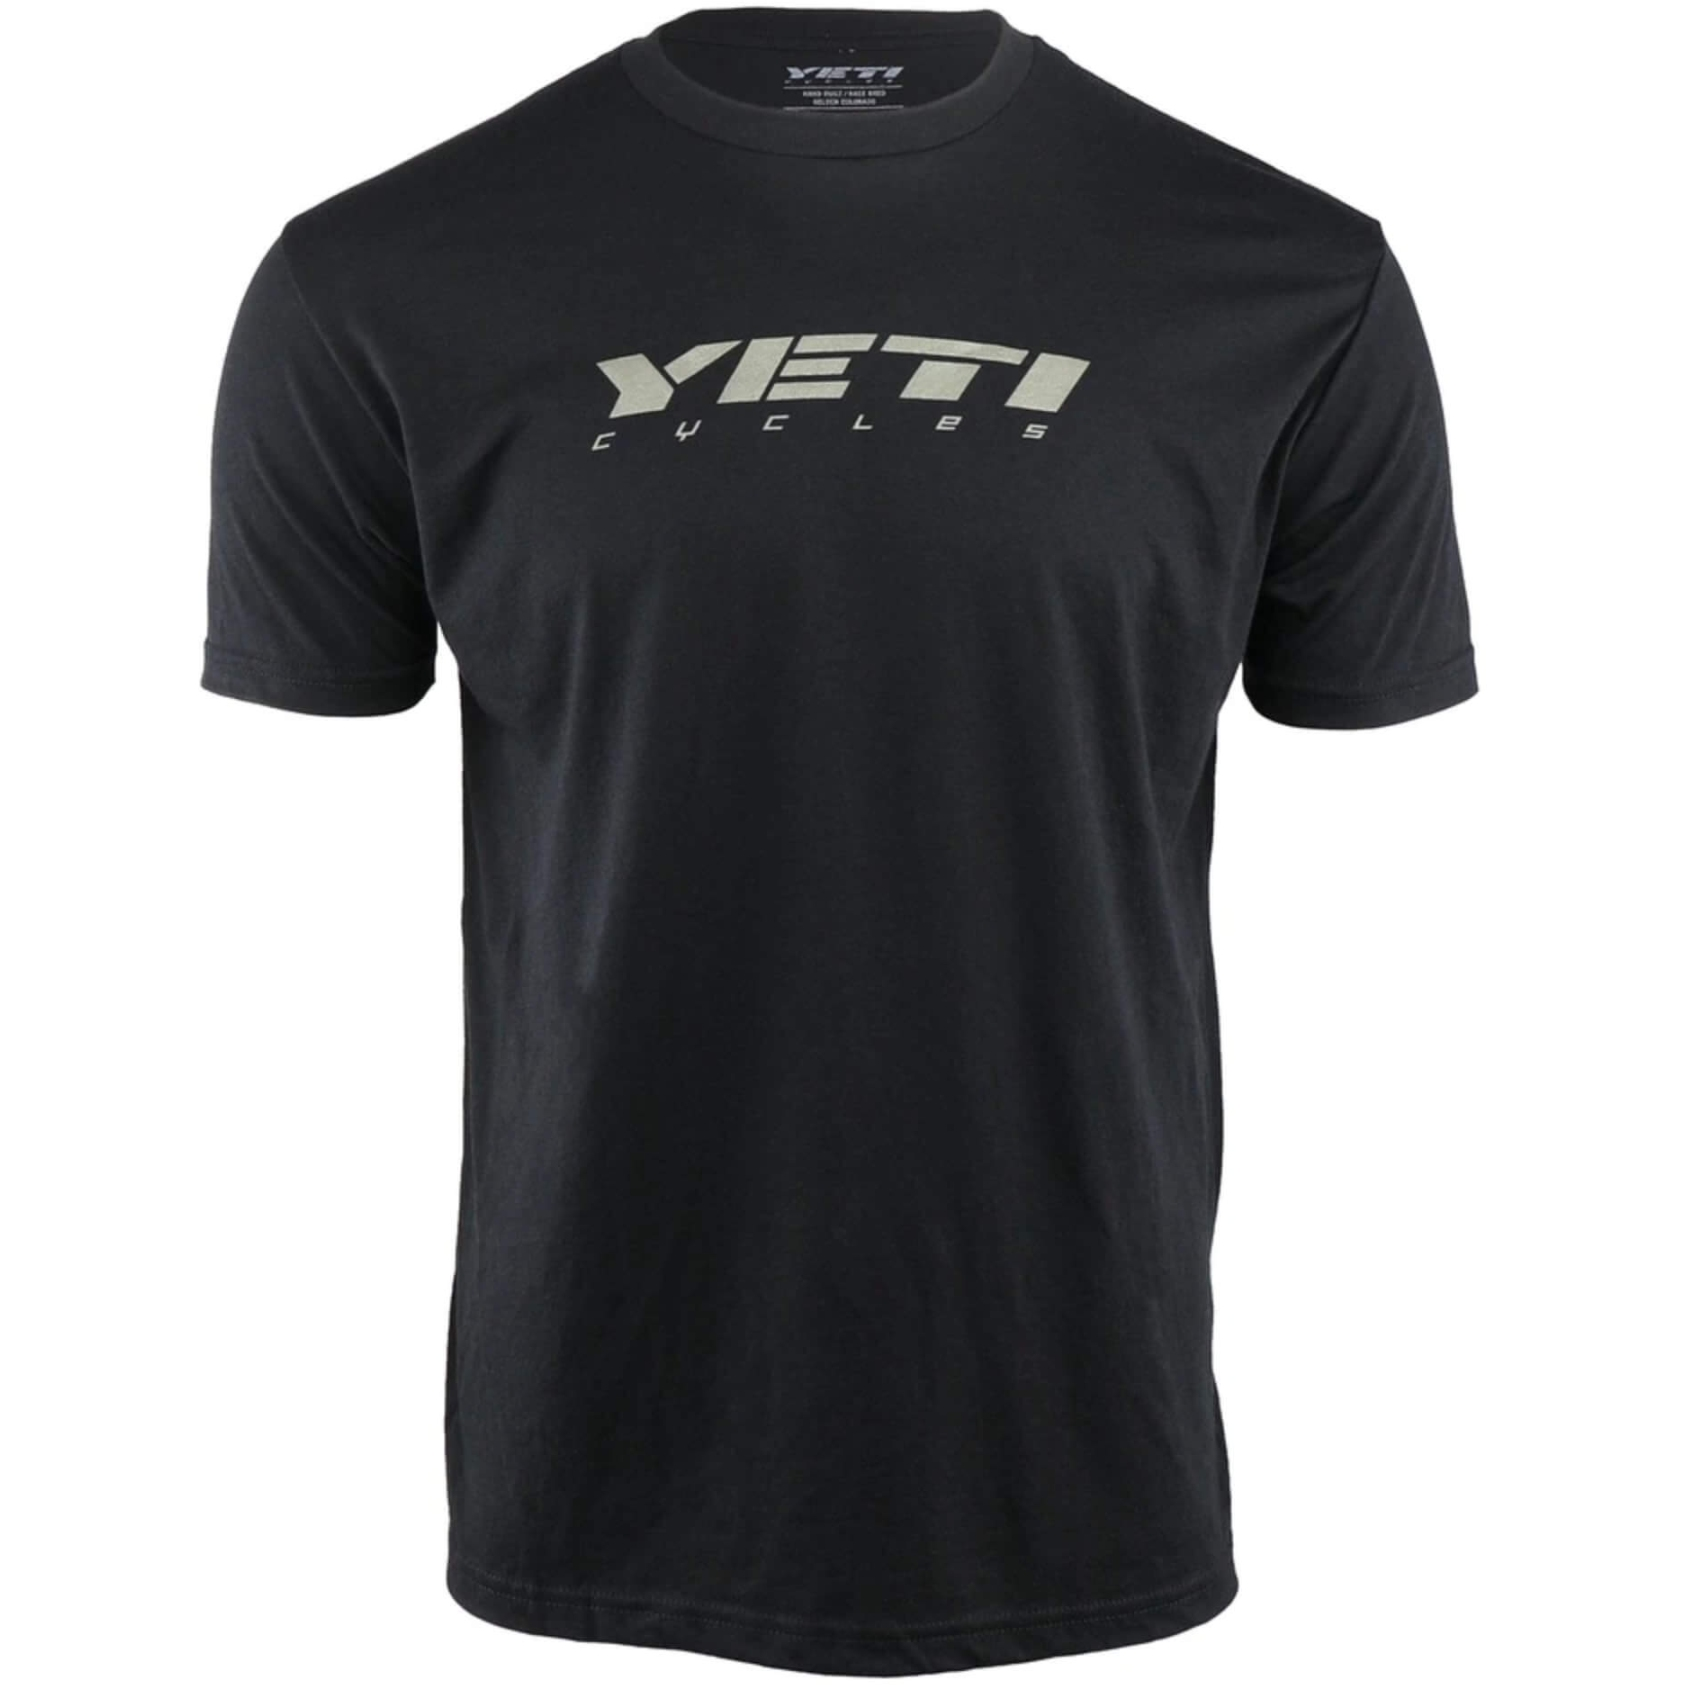 Yeti Cycles Slant T-Shirt - Black